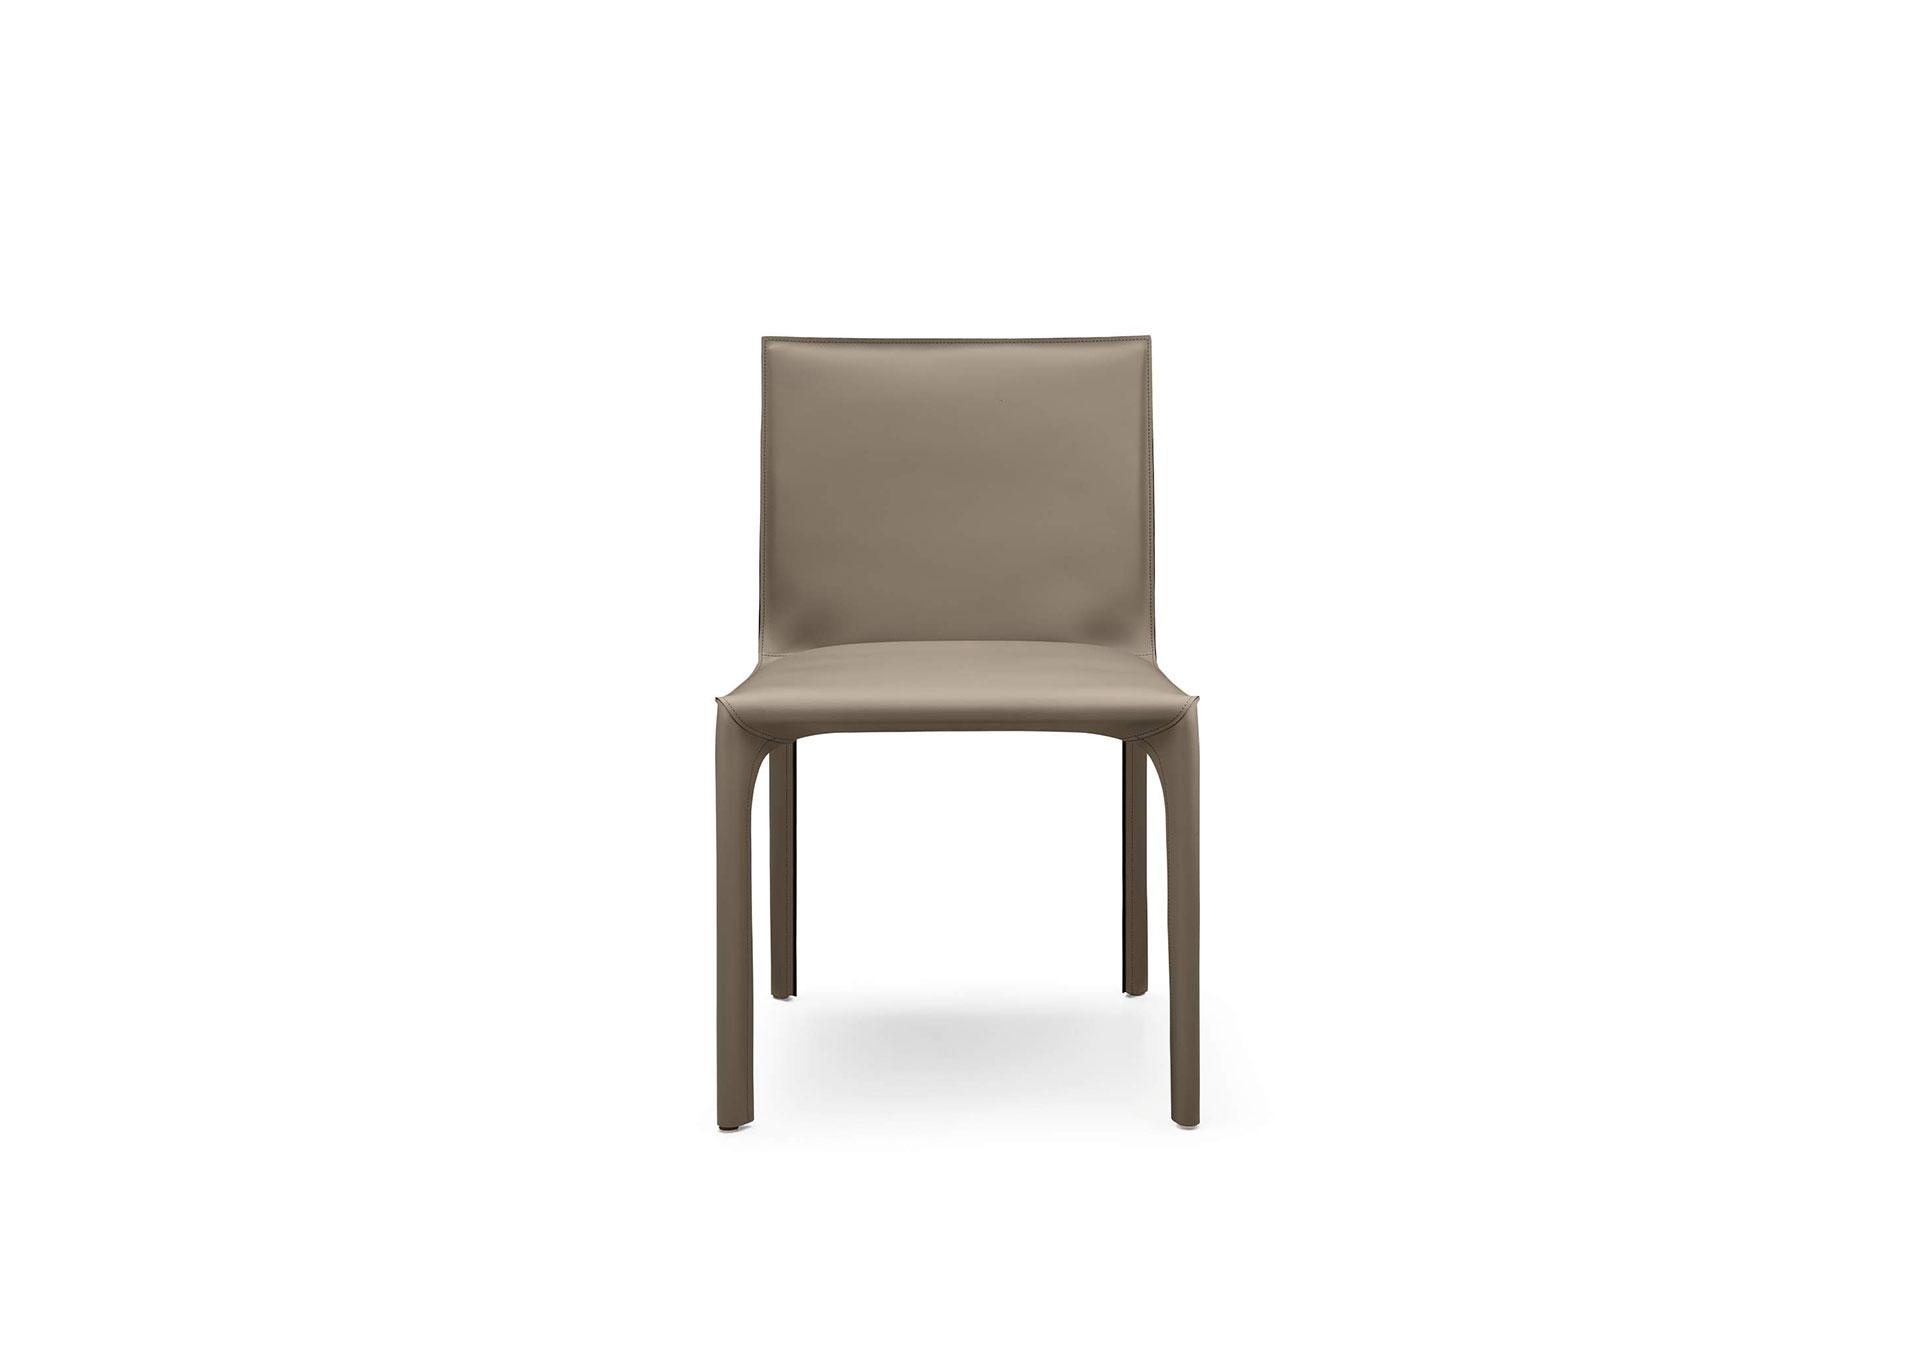 Saddle Chair Stuhl Von Walter Knoll Saddle1243 Lakeside